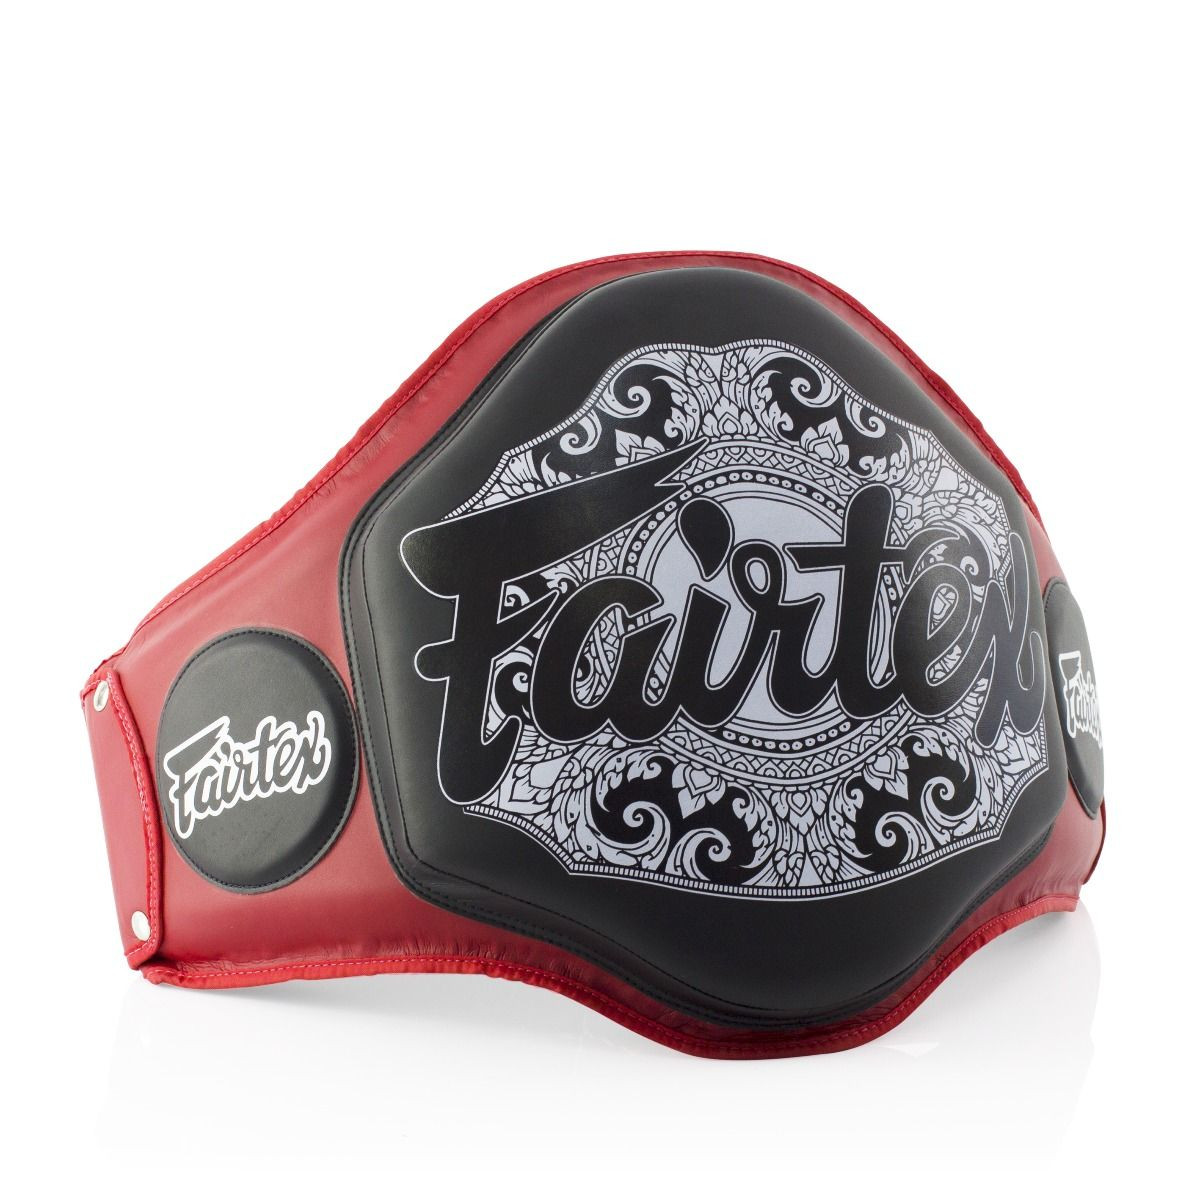 Fairtex Boxing Muay Thai Microfiber Belly Pad Red/Black